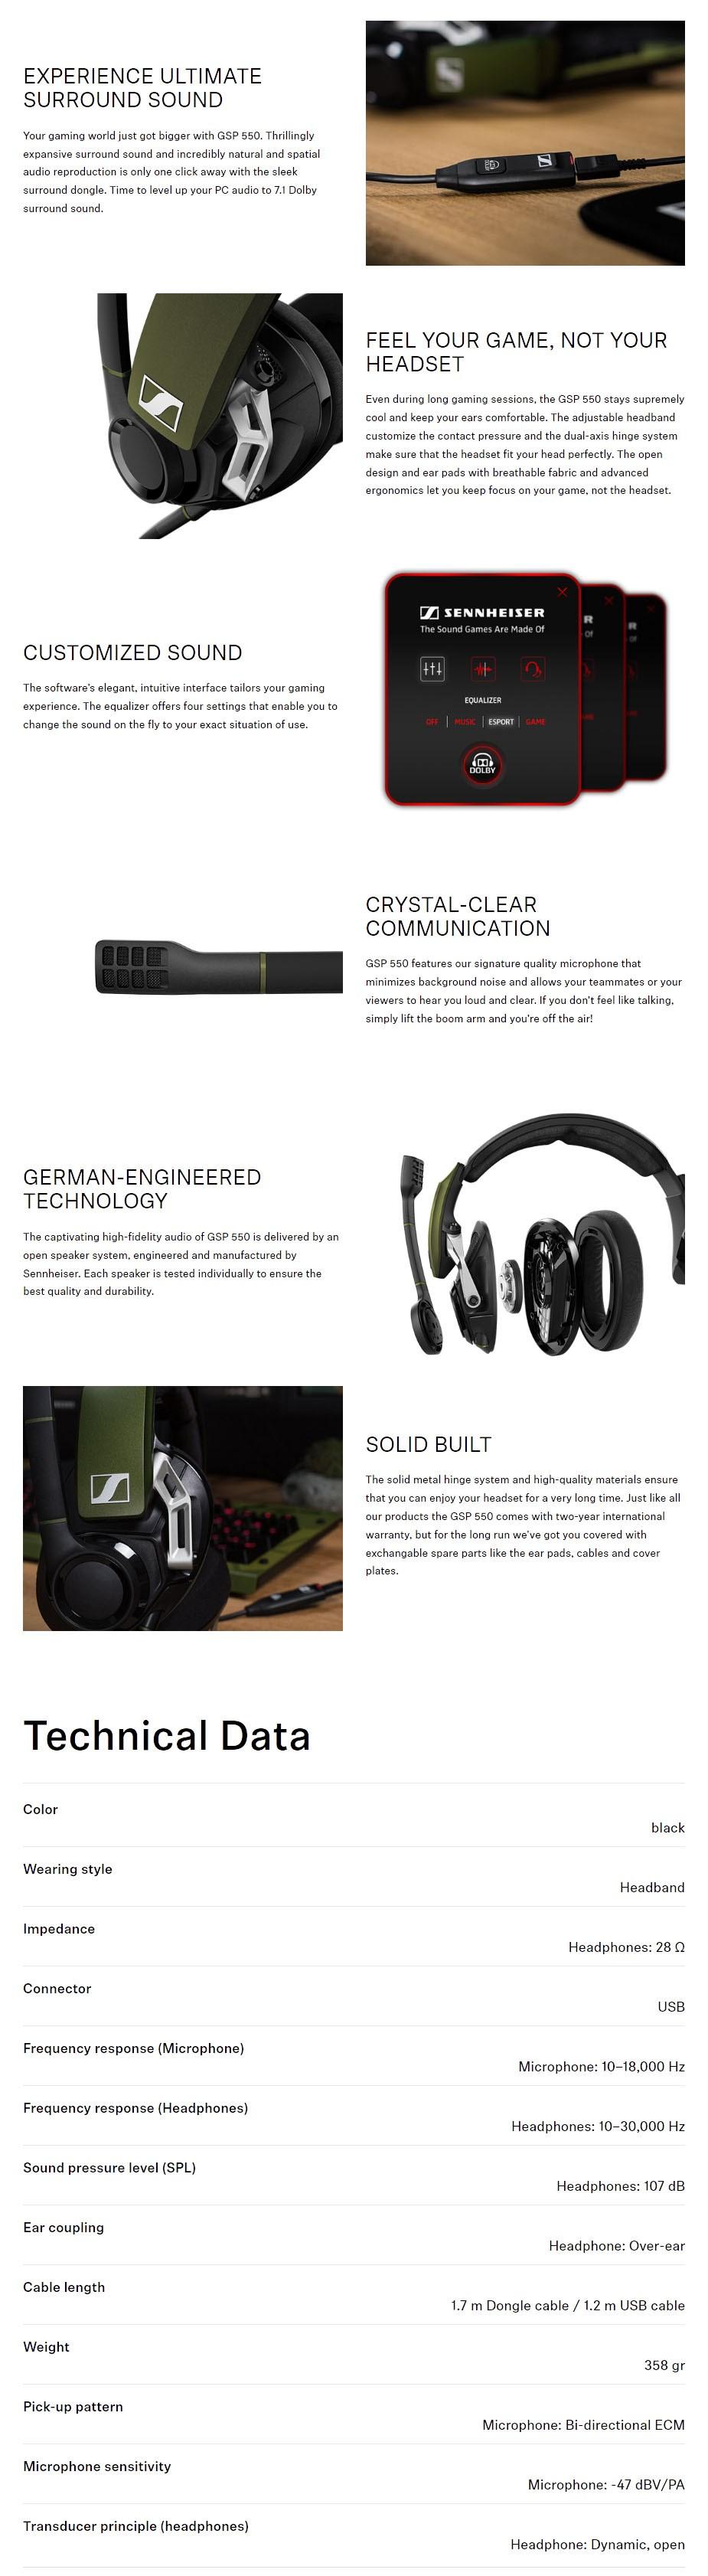 Sennheiser GSP 550 7.1 Surround Sound USB Gaming Headset - Overview 1